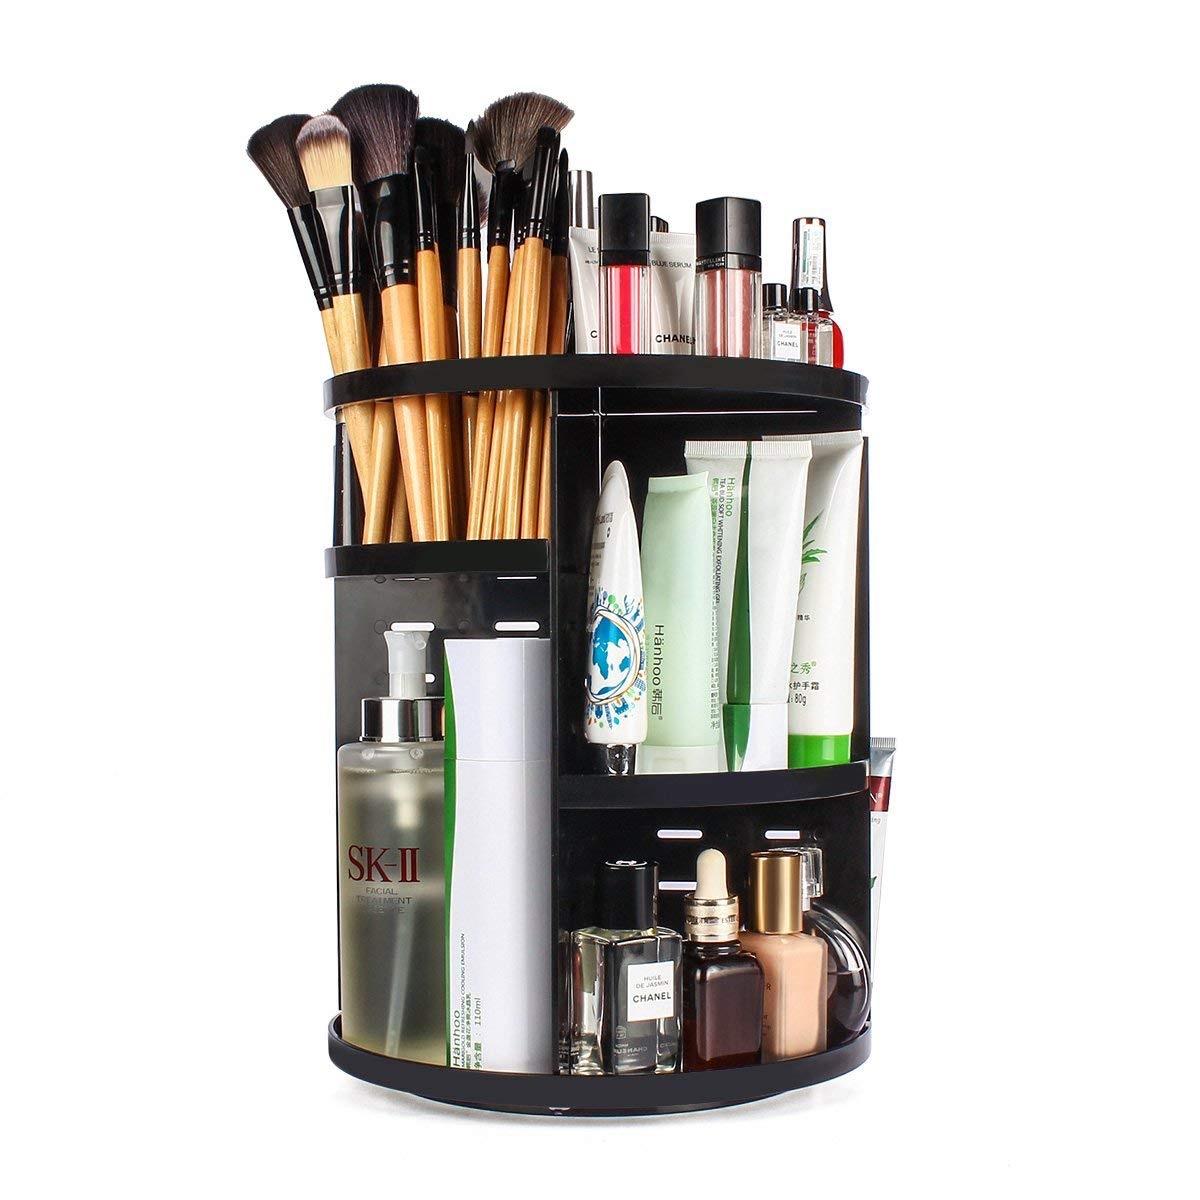 Makeup Organizer {Organizational Products on Amazon}